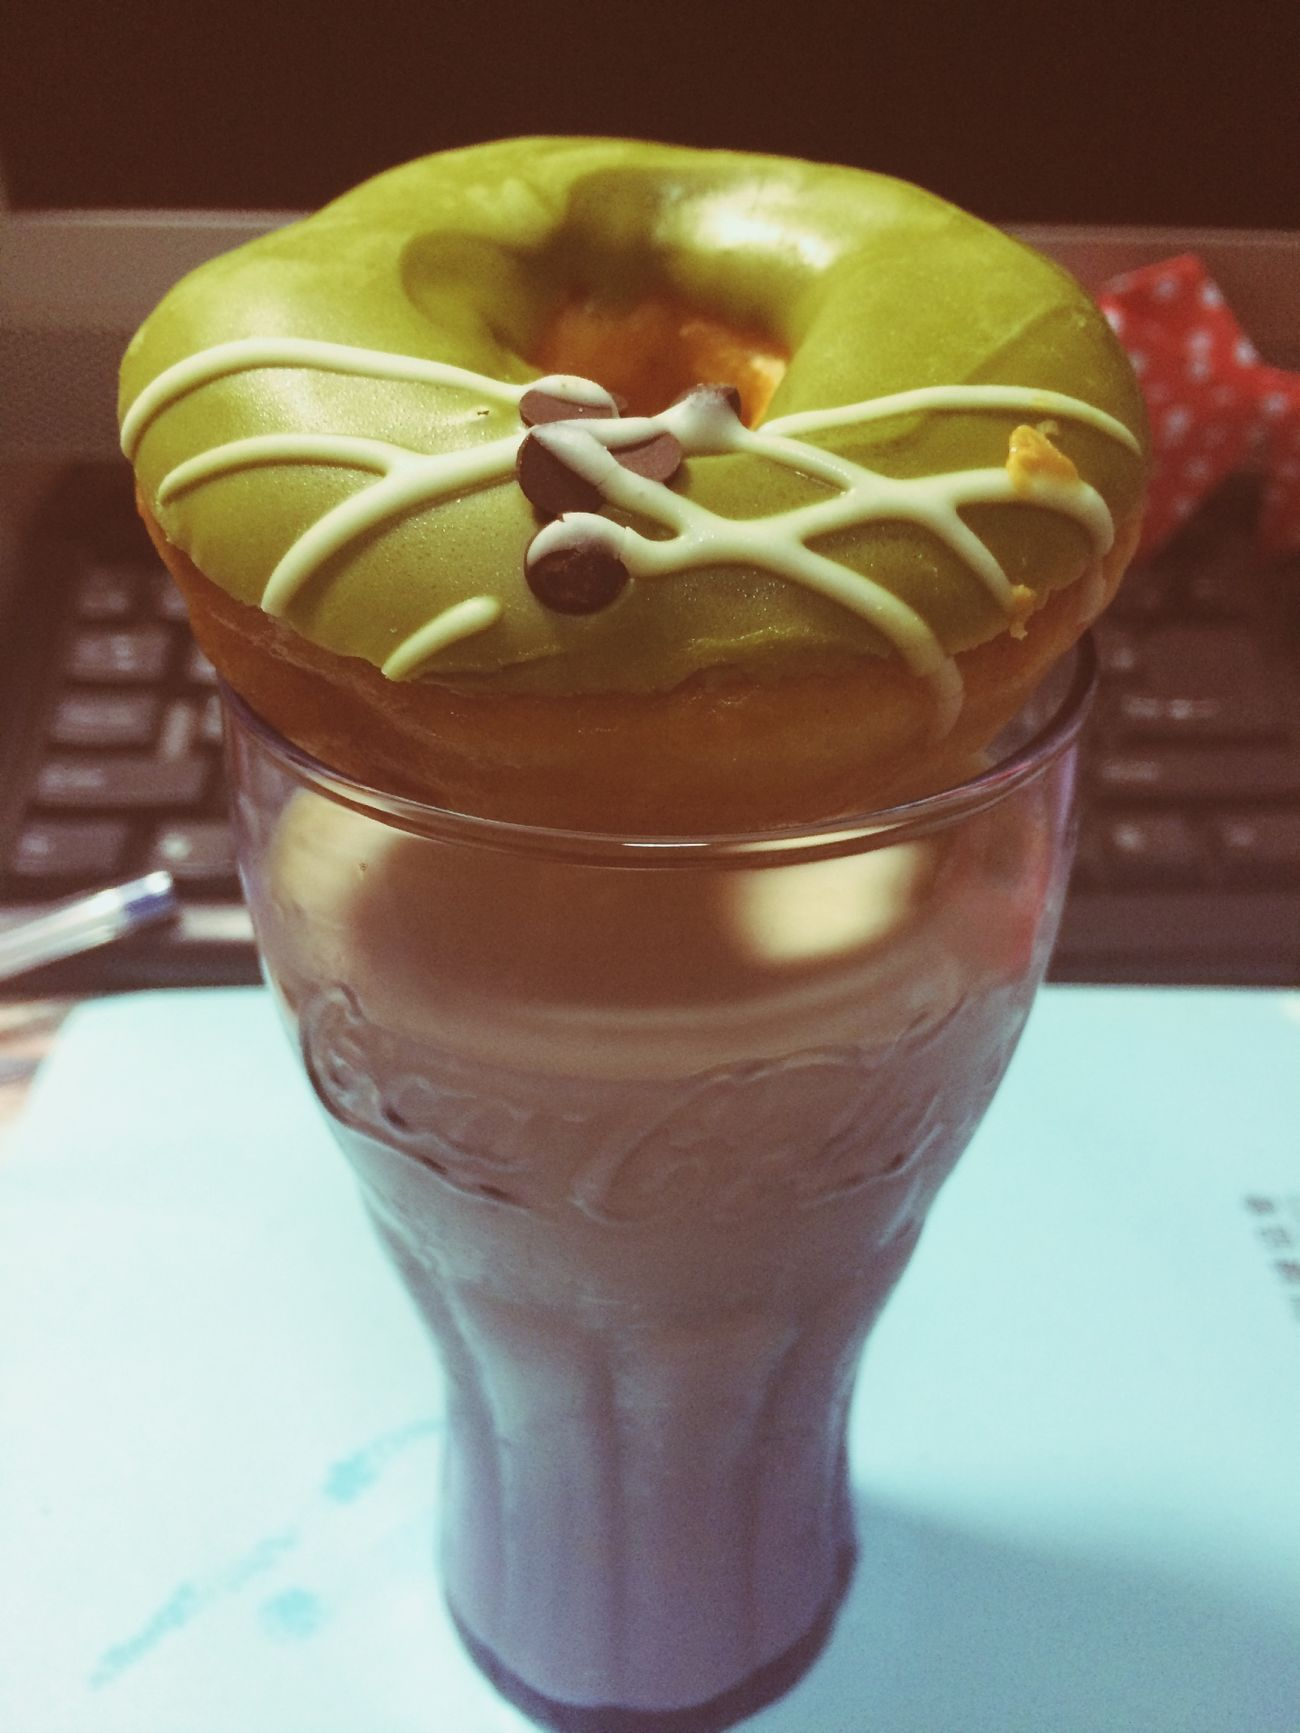 Morning⋯ 吃著啾比送我的甜甜圈 加上特調咖啡奶酒+鮮奶 繼續追劇去⋯ 皮諾丘真的卡關太久了! 吃吃喝喝看韓劇 不出門也爽!